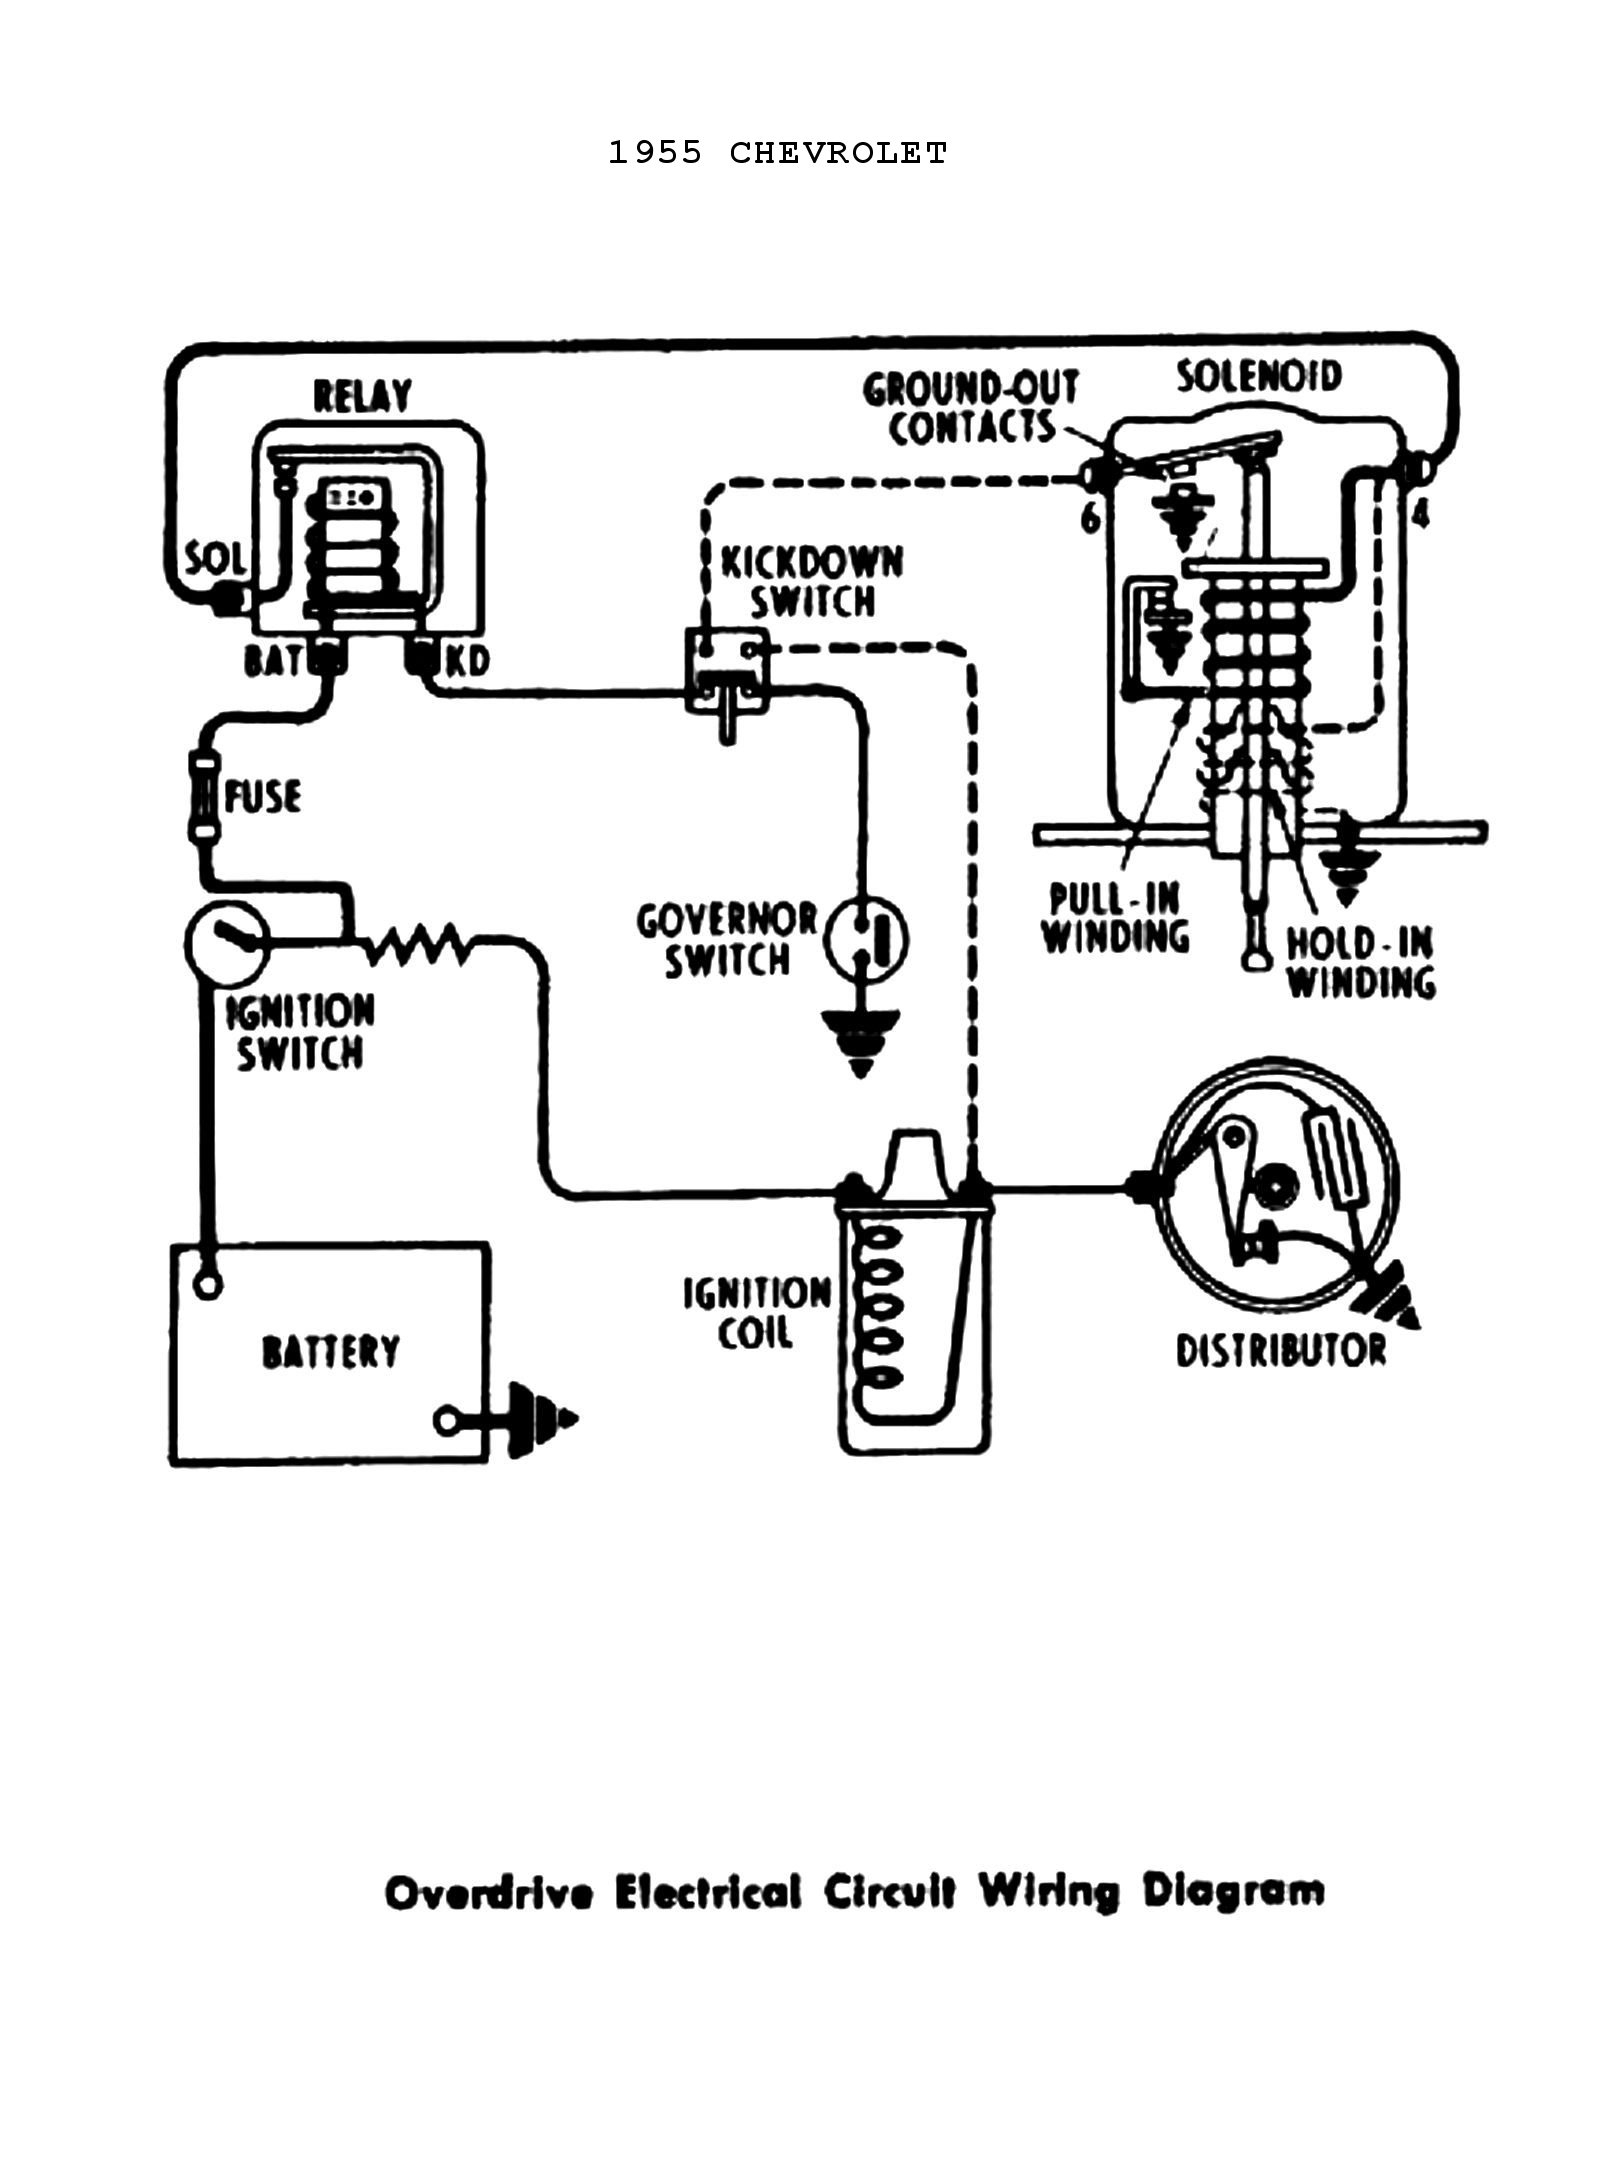 Pertronix Ignitor Wiring Diagram | Manual E-Books - Pertronix Ignitor Wiring Diagram